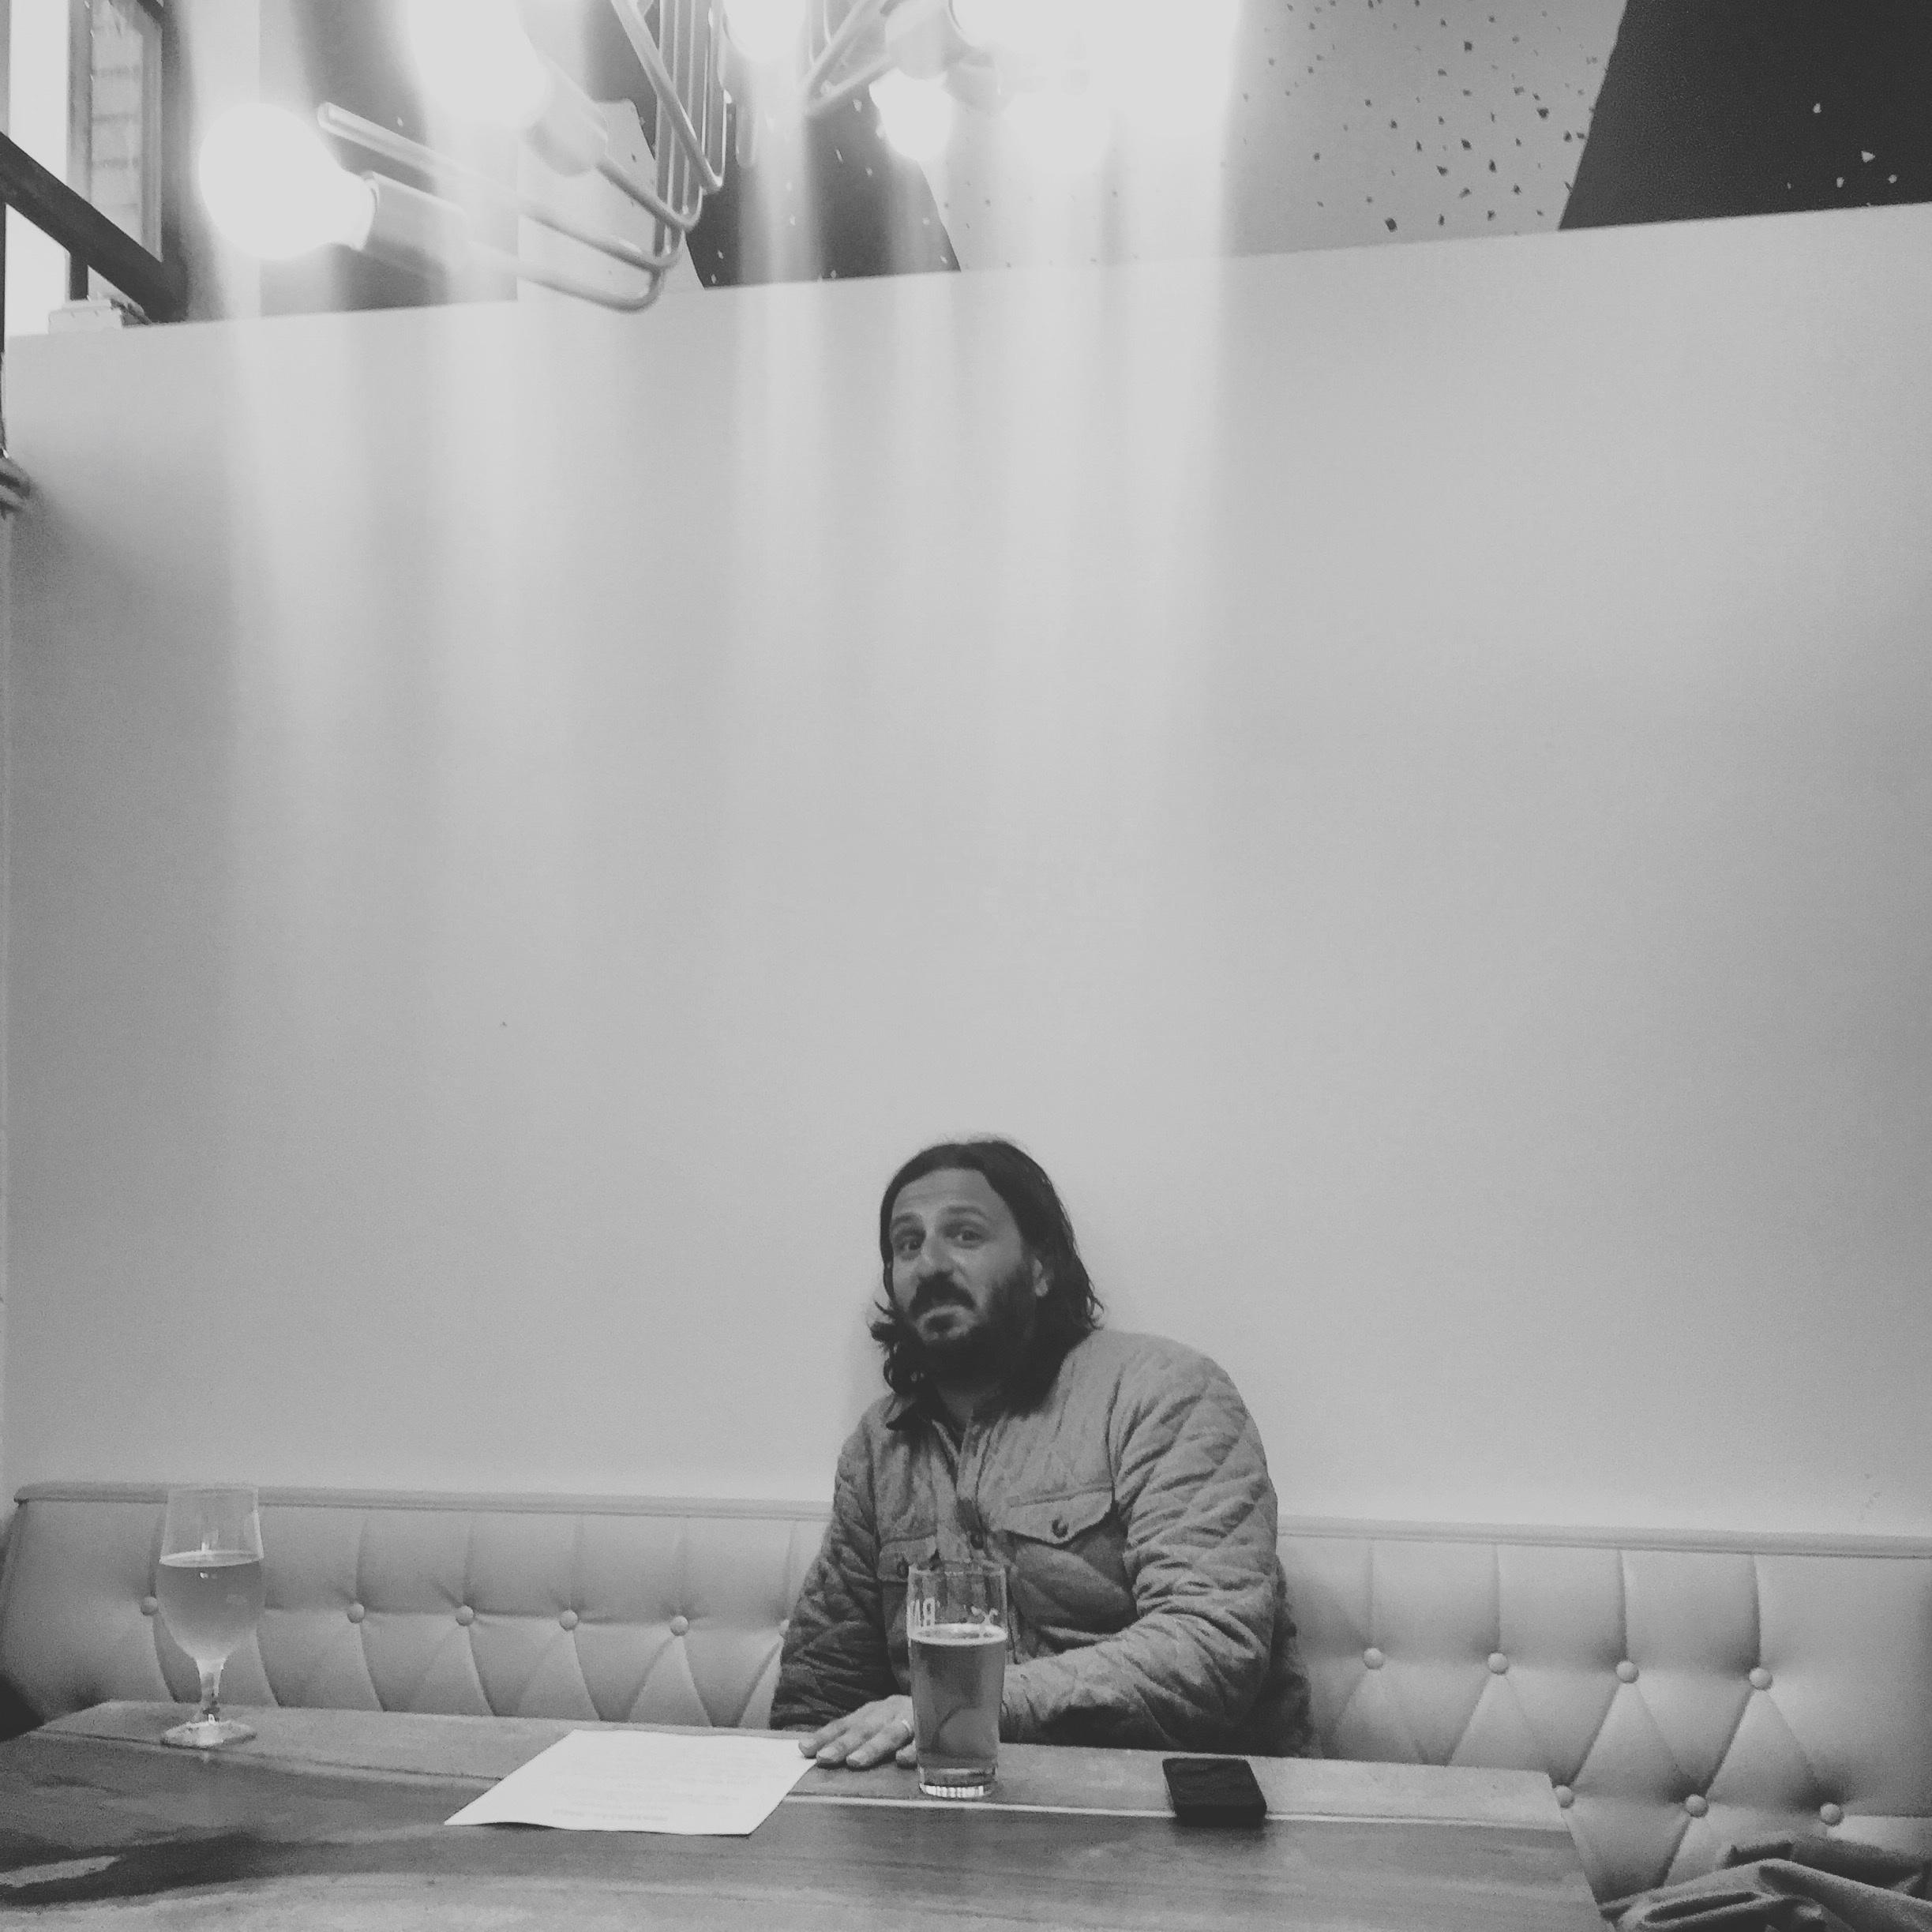 John Angelopulos, CD/Copy, Piggyback